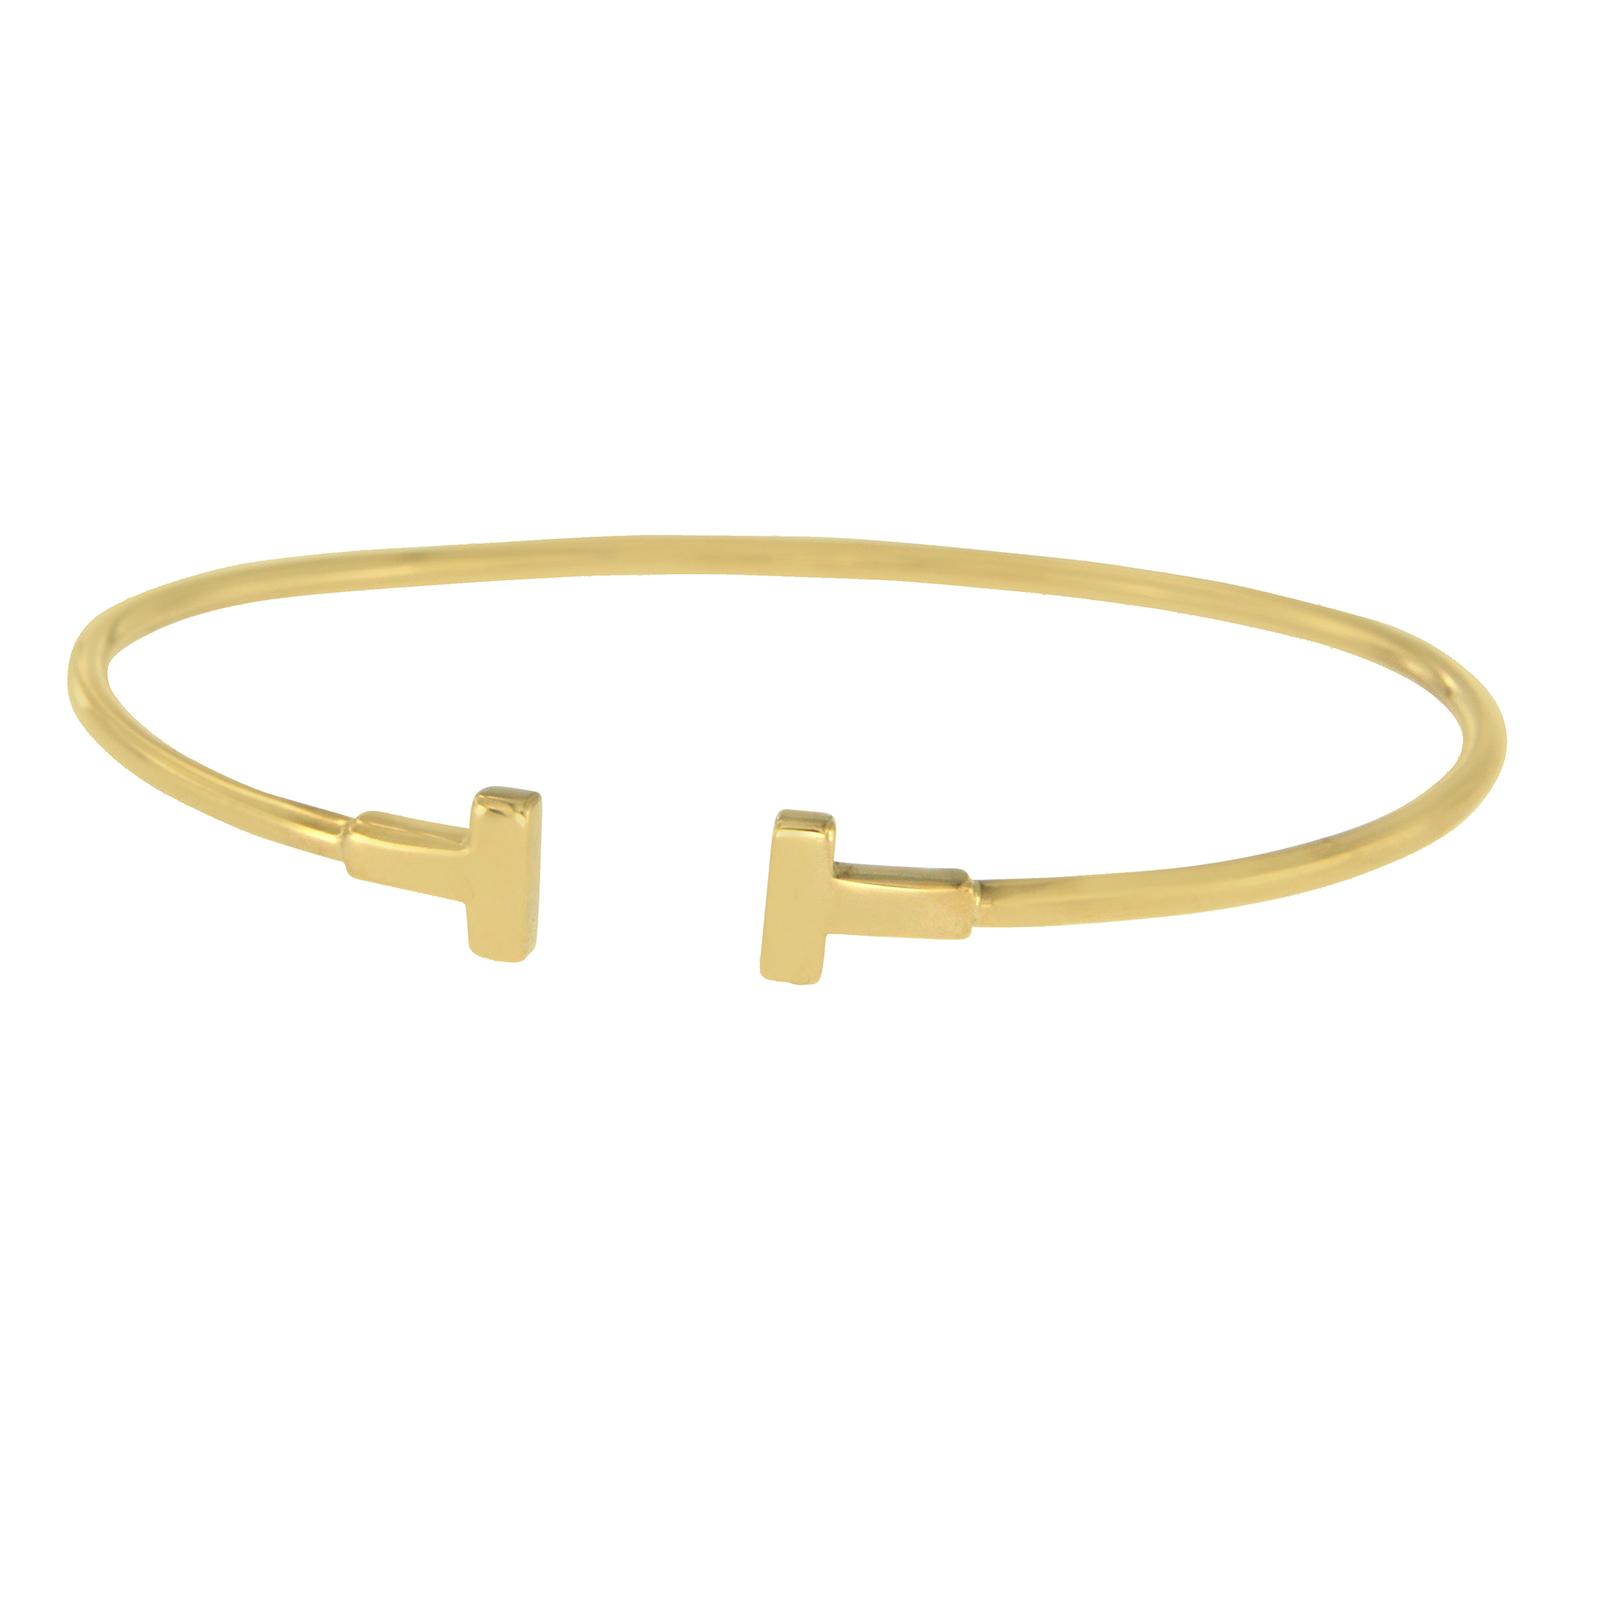 Tiffany Co 18k Yellow Gold T Wire Bangle Bracelet Tiffany Co Buy At Truefacet